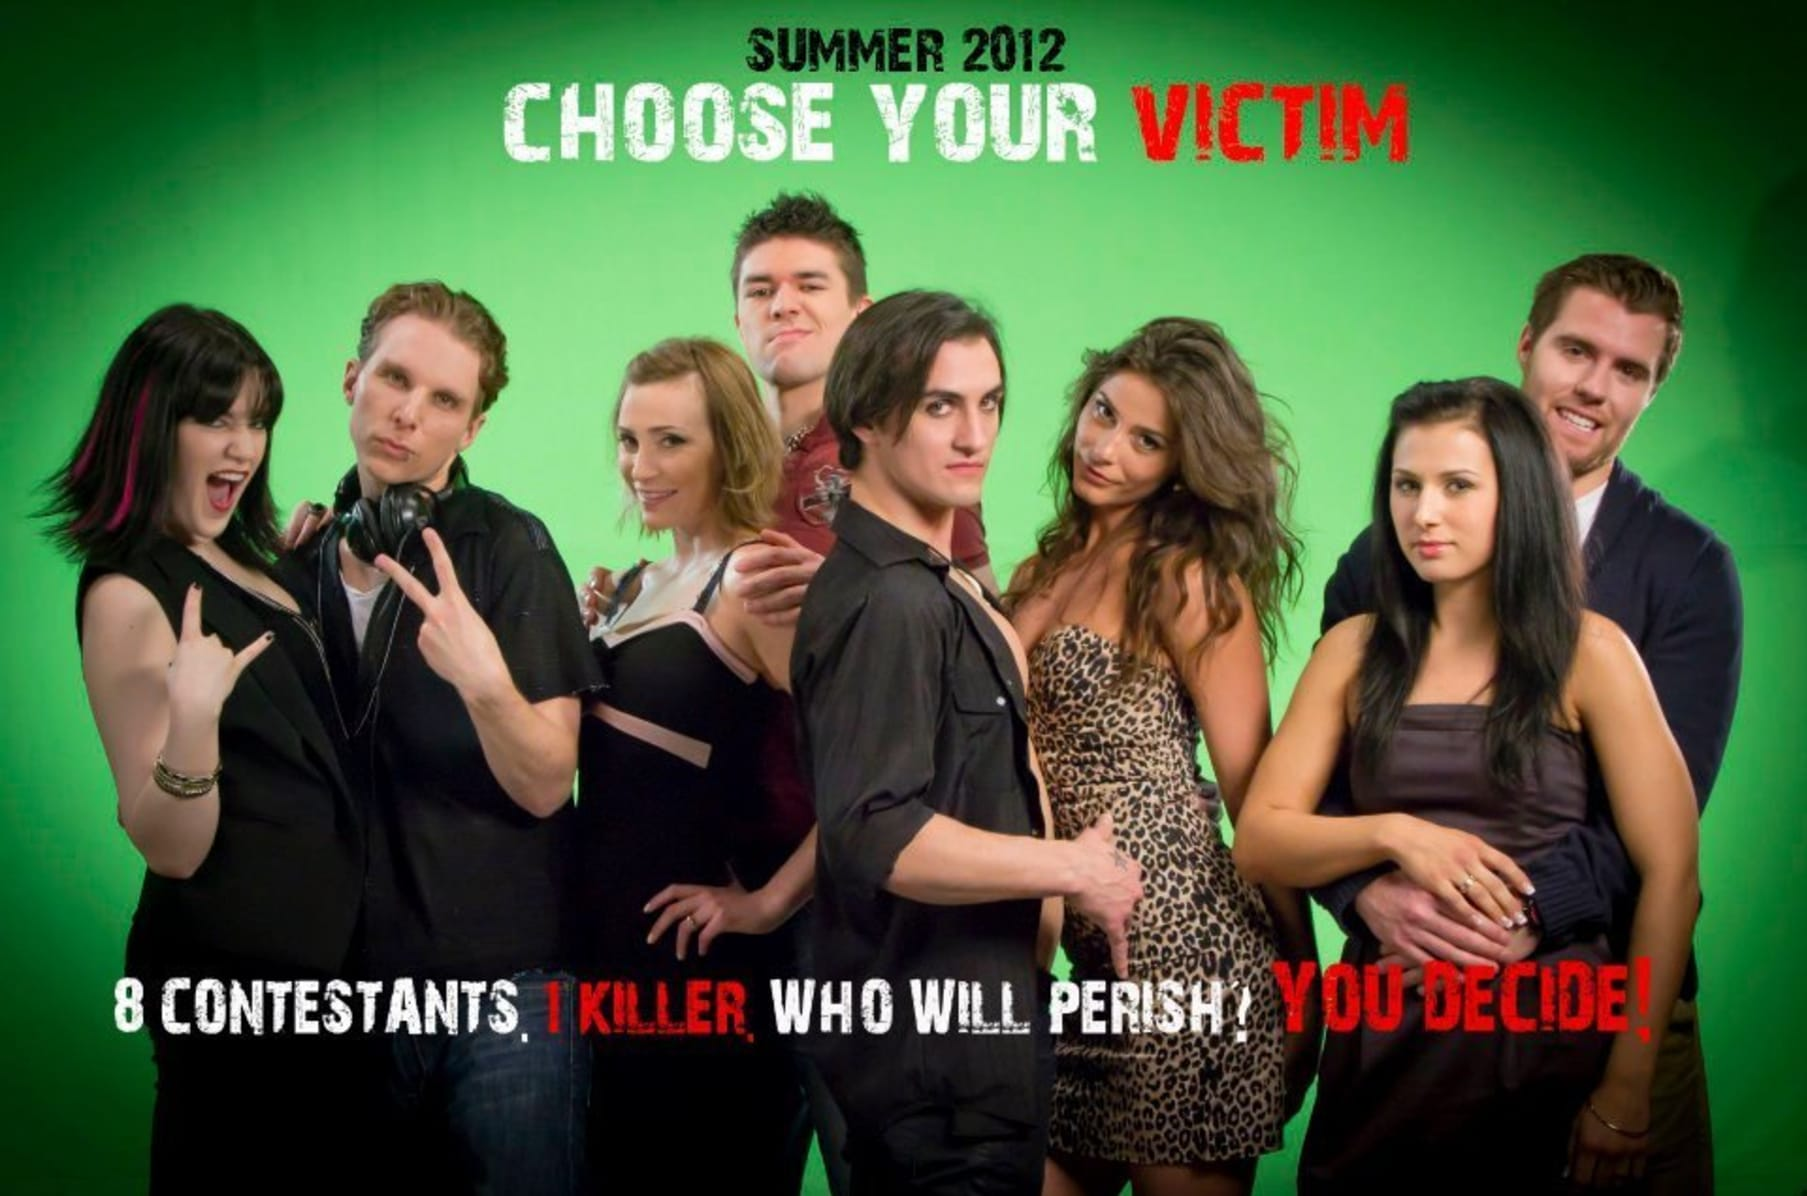 Choose Your Victim